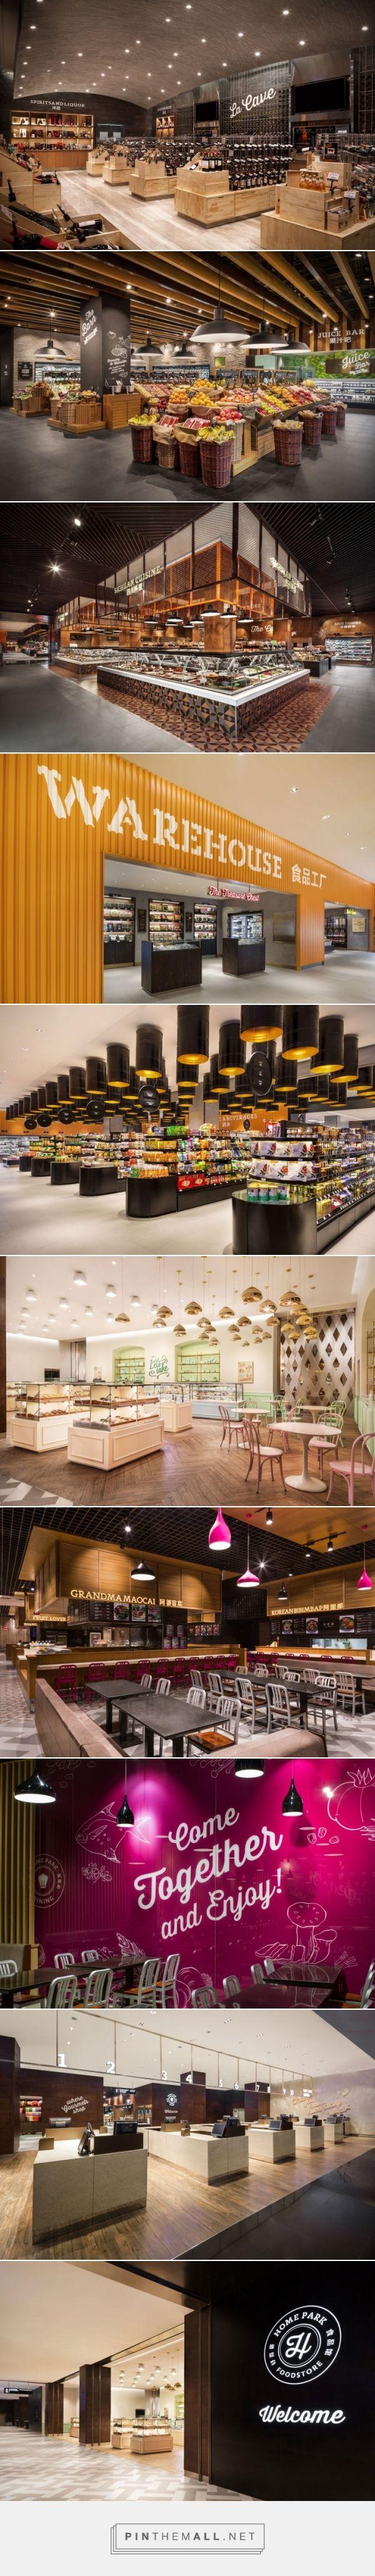 Supermarket (Supermercado)